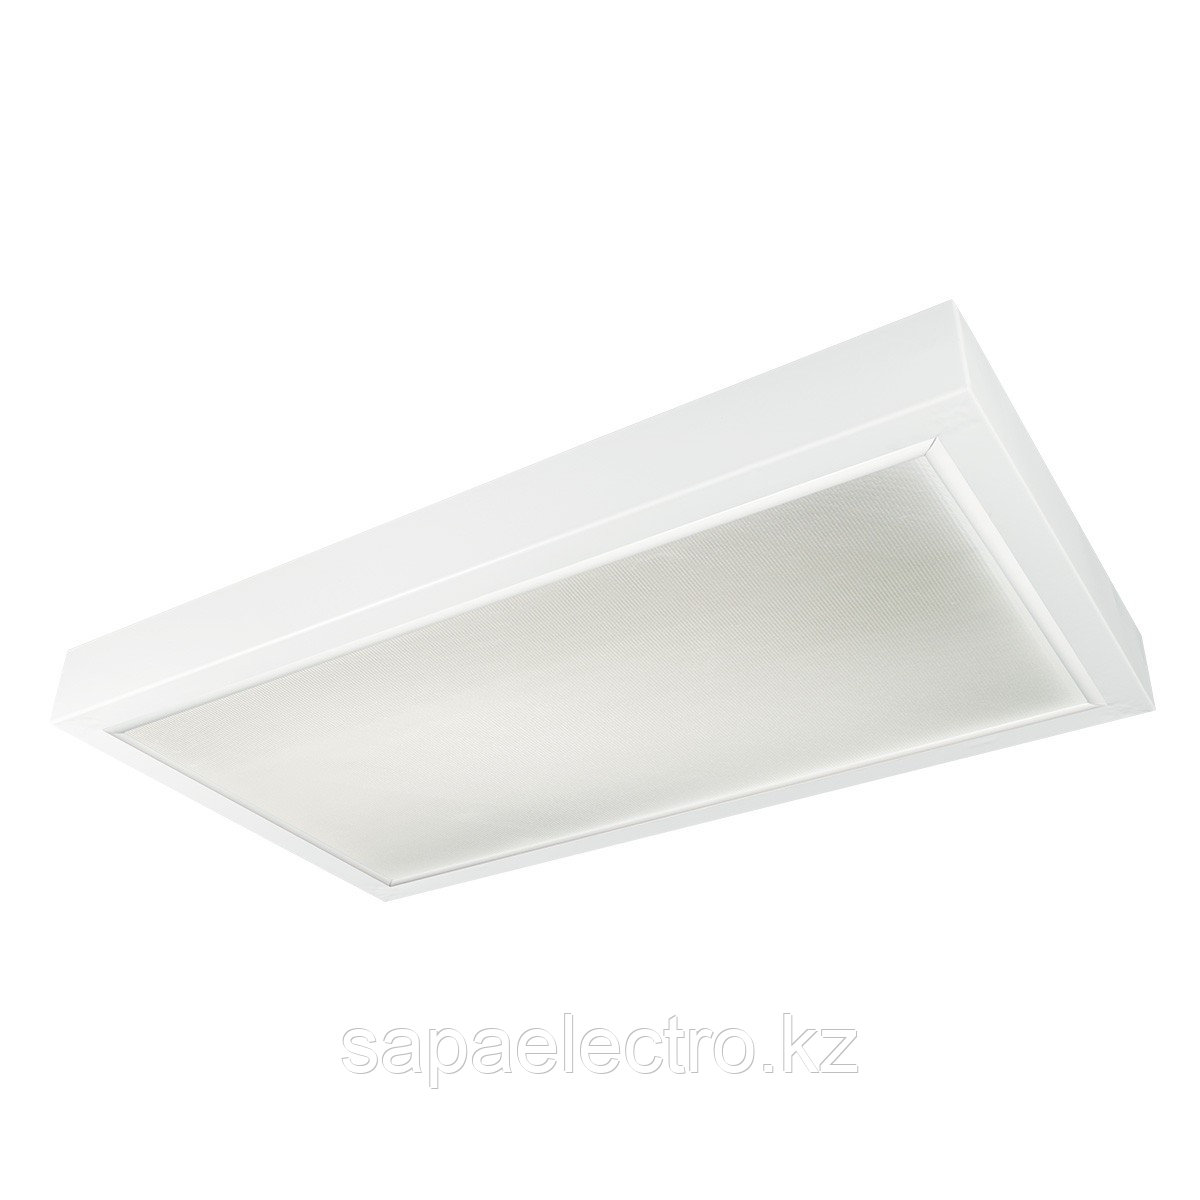 Св LEDTUBE 2x9W/ 60см PINSPOT MODERNA (с лампой) MG